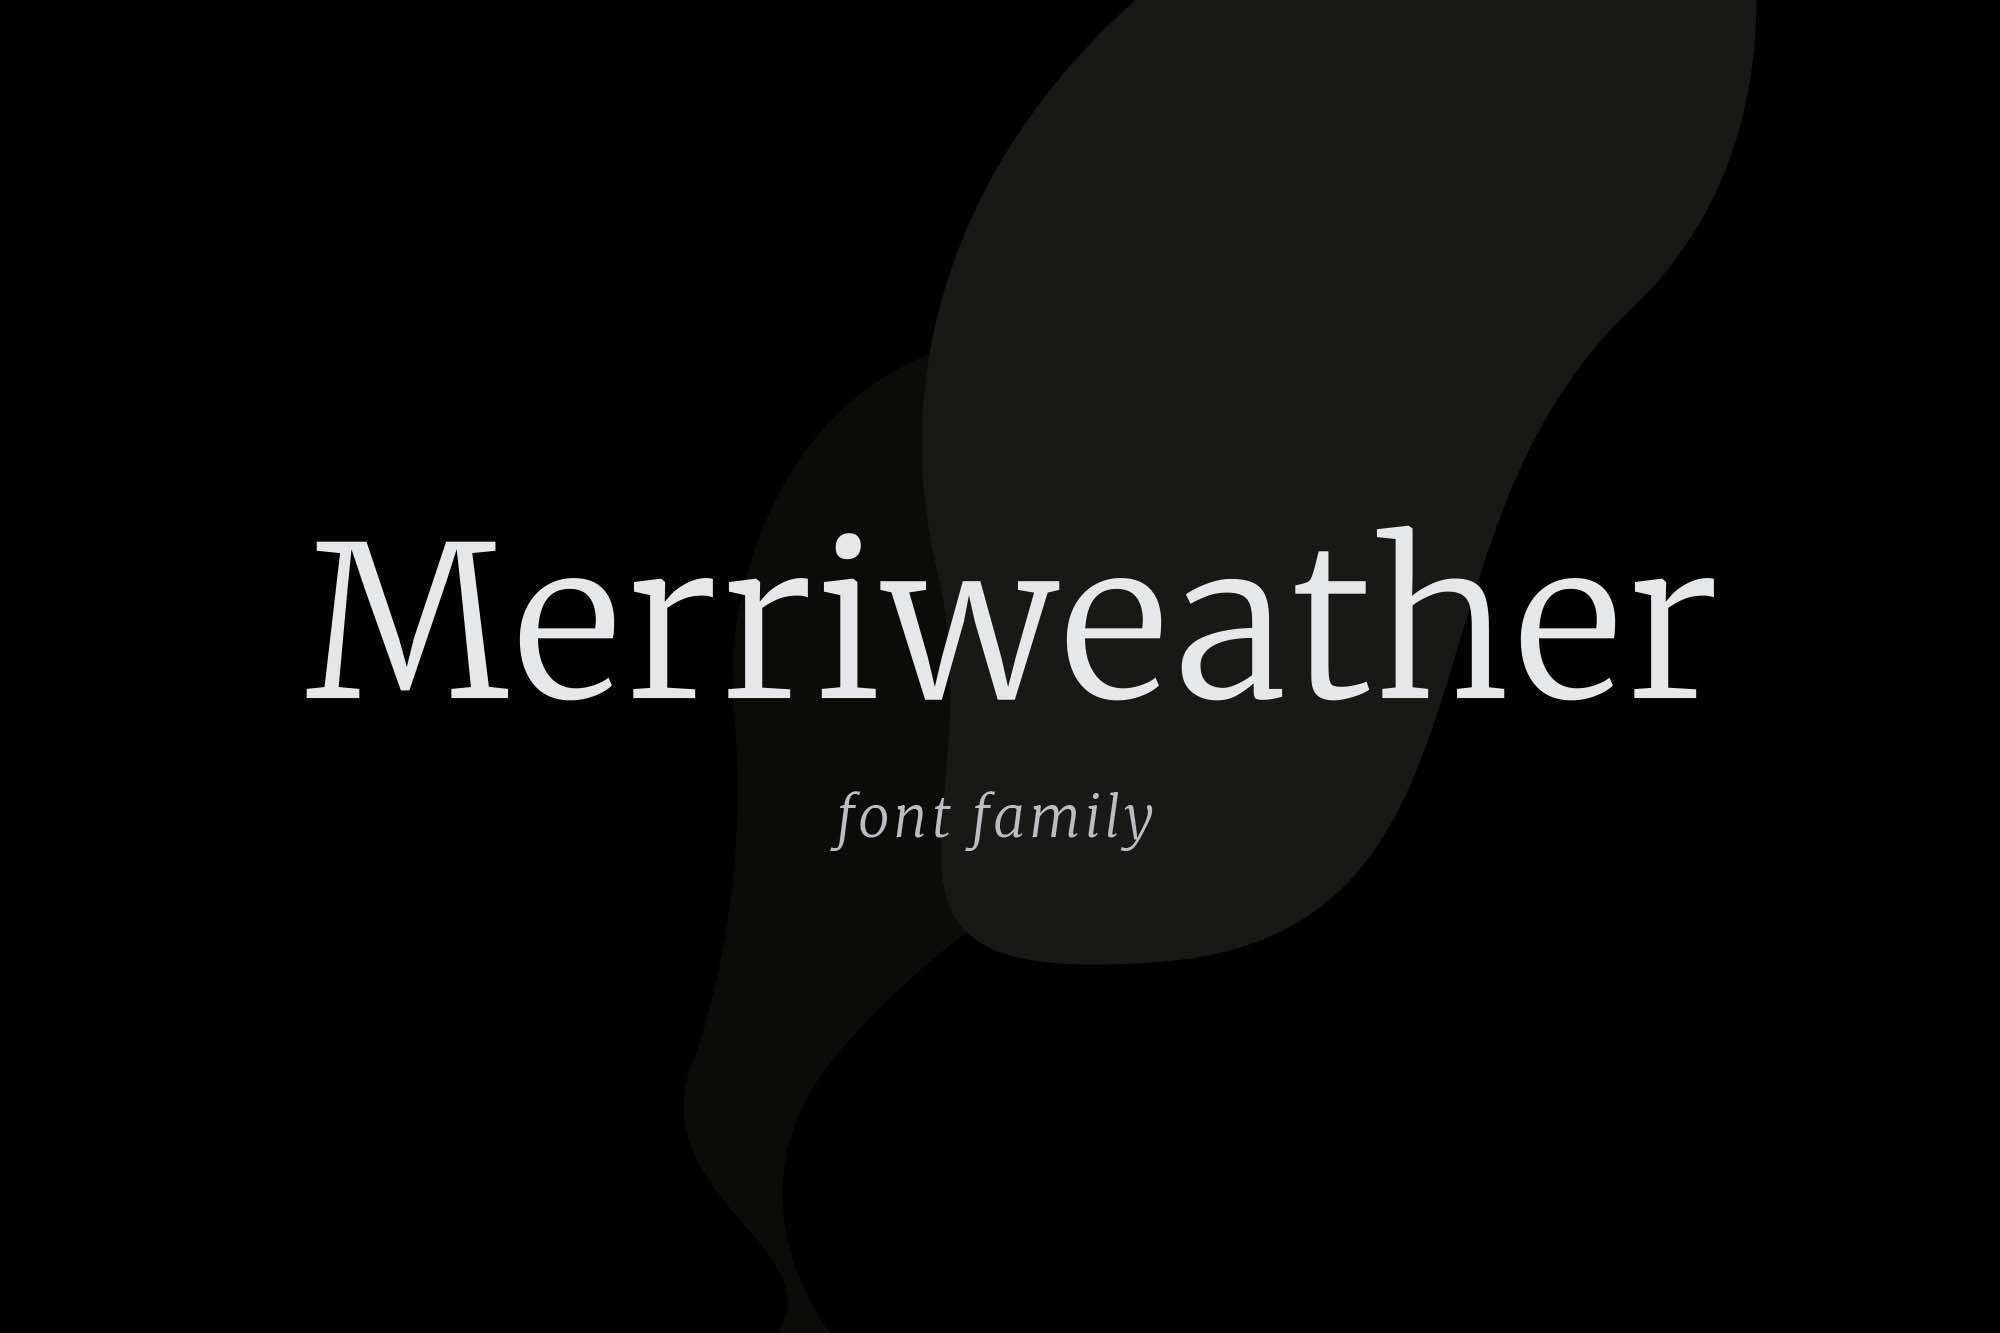 Merriweather Serif Typeface